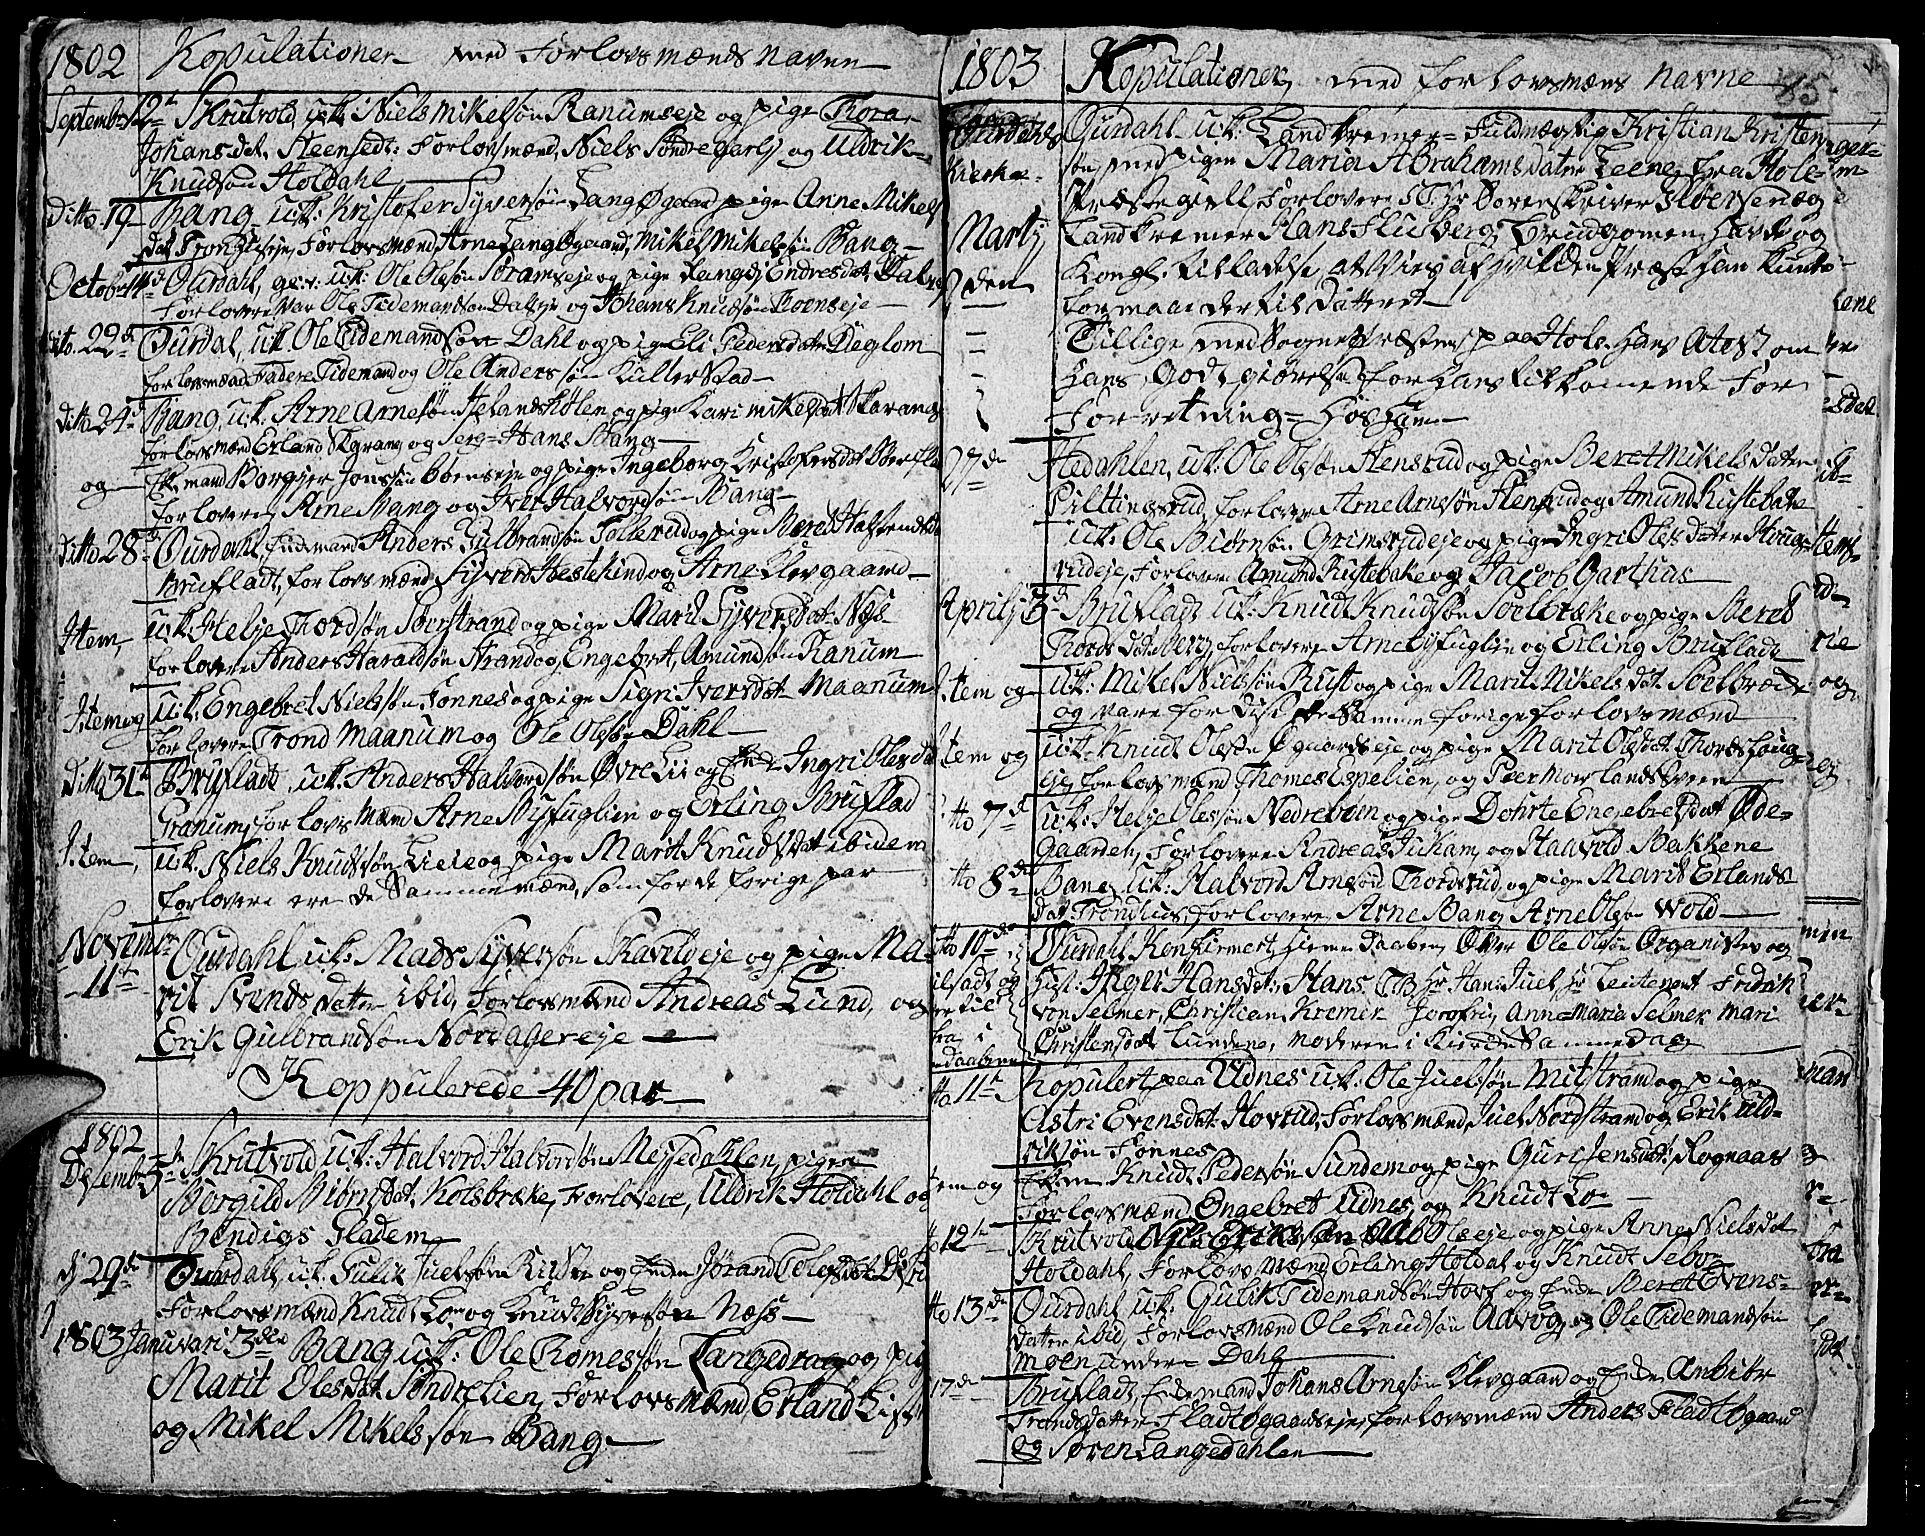 SAH, Aurdal prestekontor, Ministerialbok nr. 7, 1800-1808, s. 85